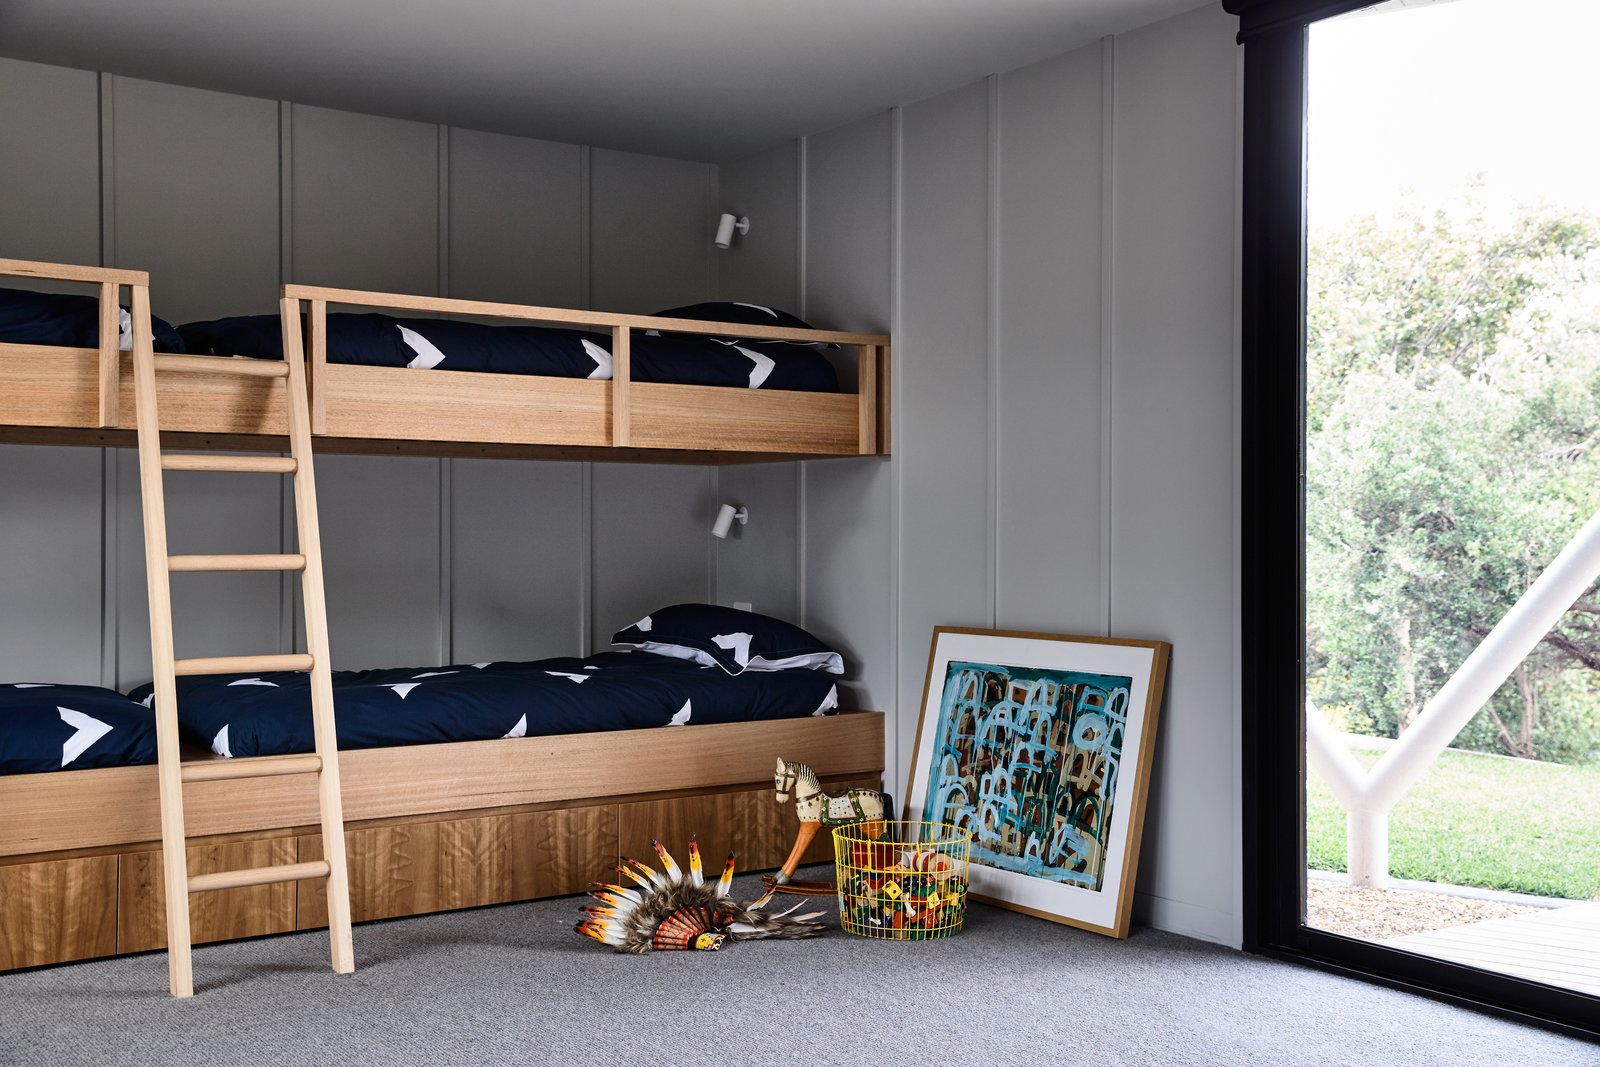 Sorrento House Figureground Architecture Rumpus Room